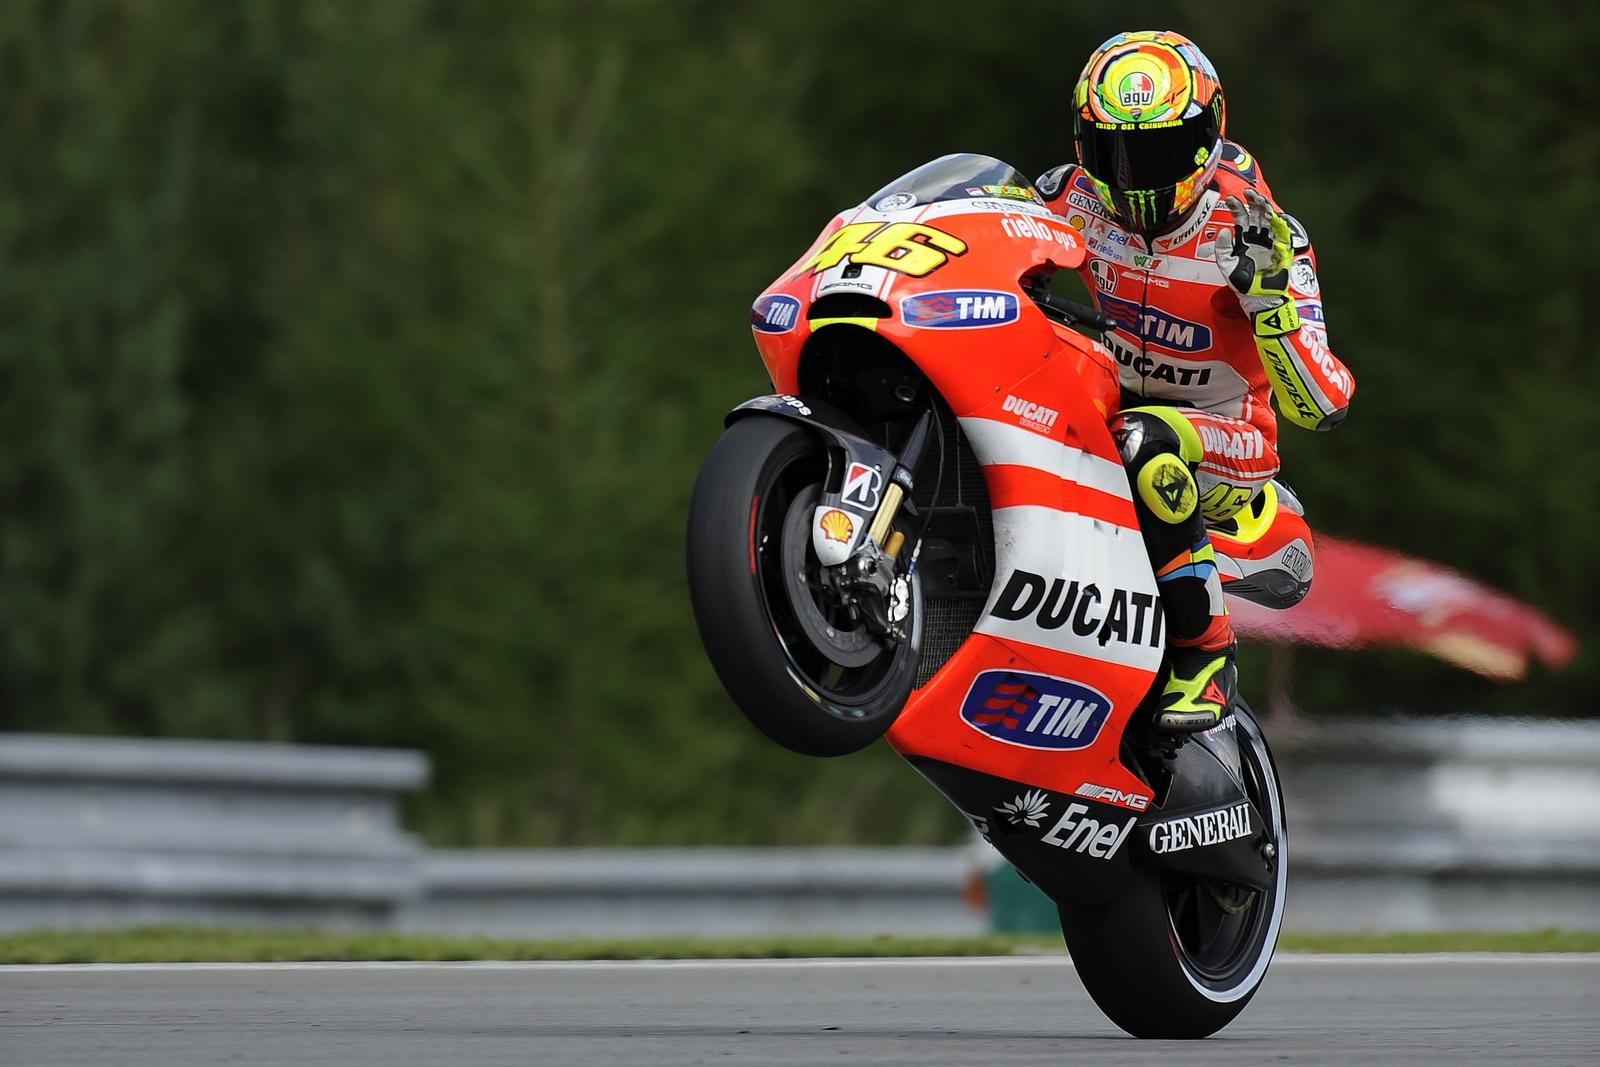 Valentino Rossi Hd Wallpaper: Wallpapers Hd For Mac: Valentino Rossi Ducati MotoGp